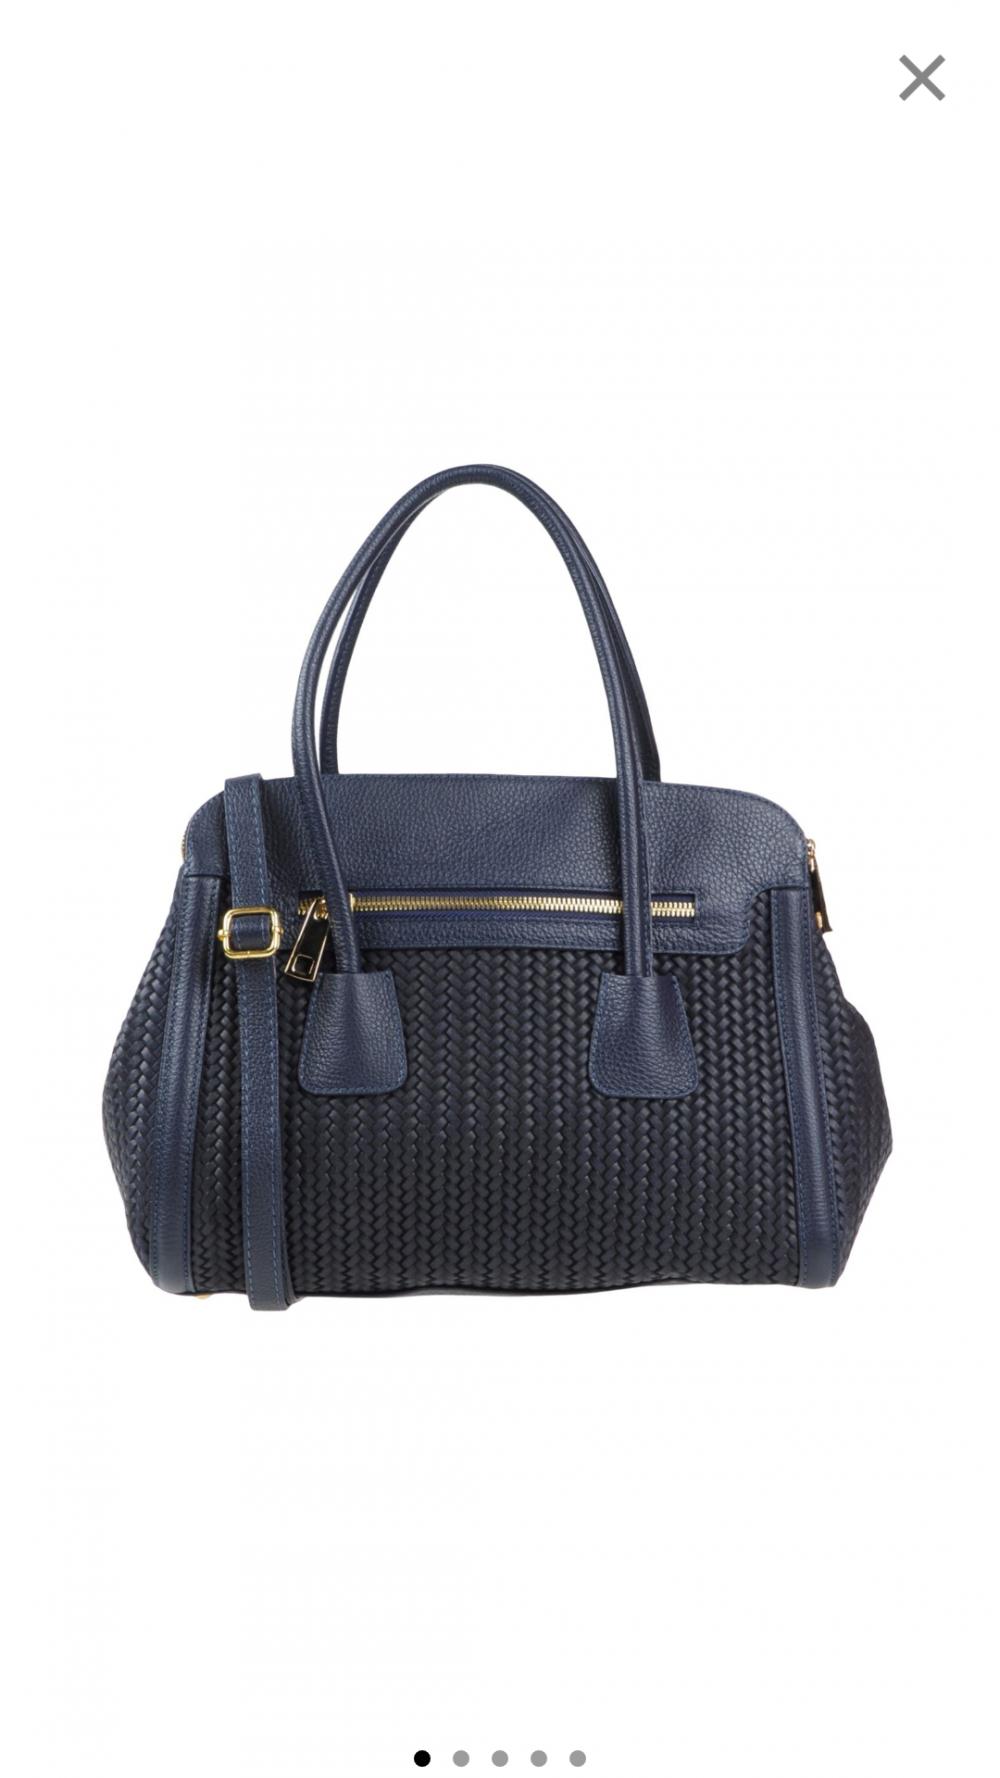 Сумка кожаная Tuscany leather, новая, темно-синяя